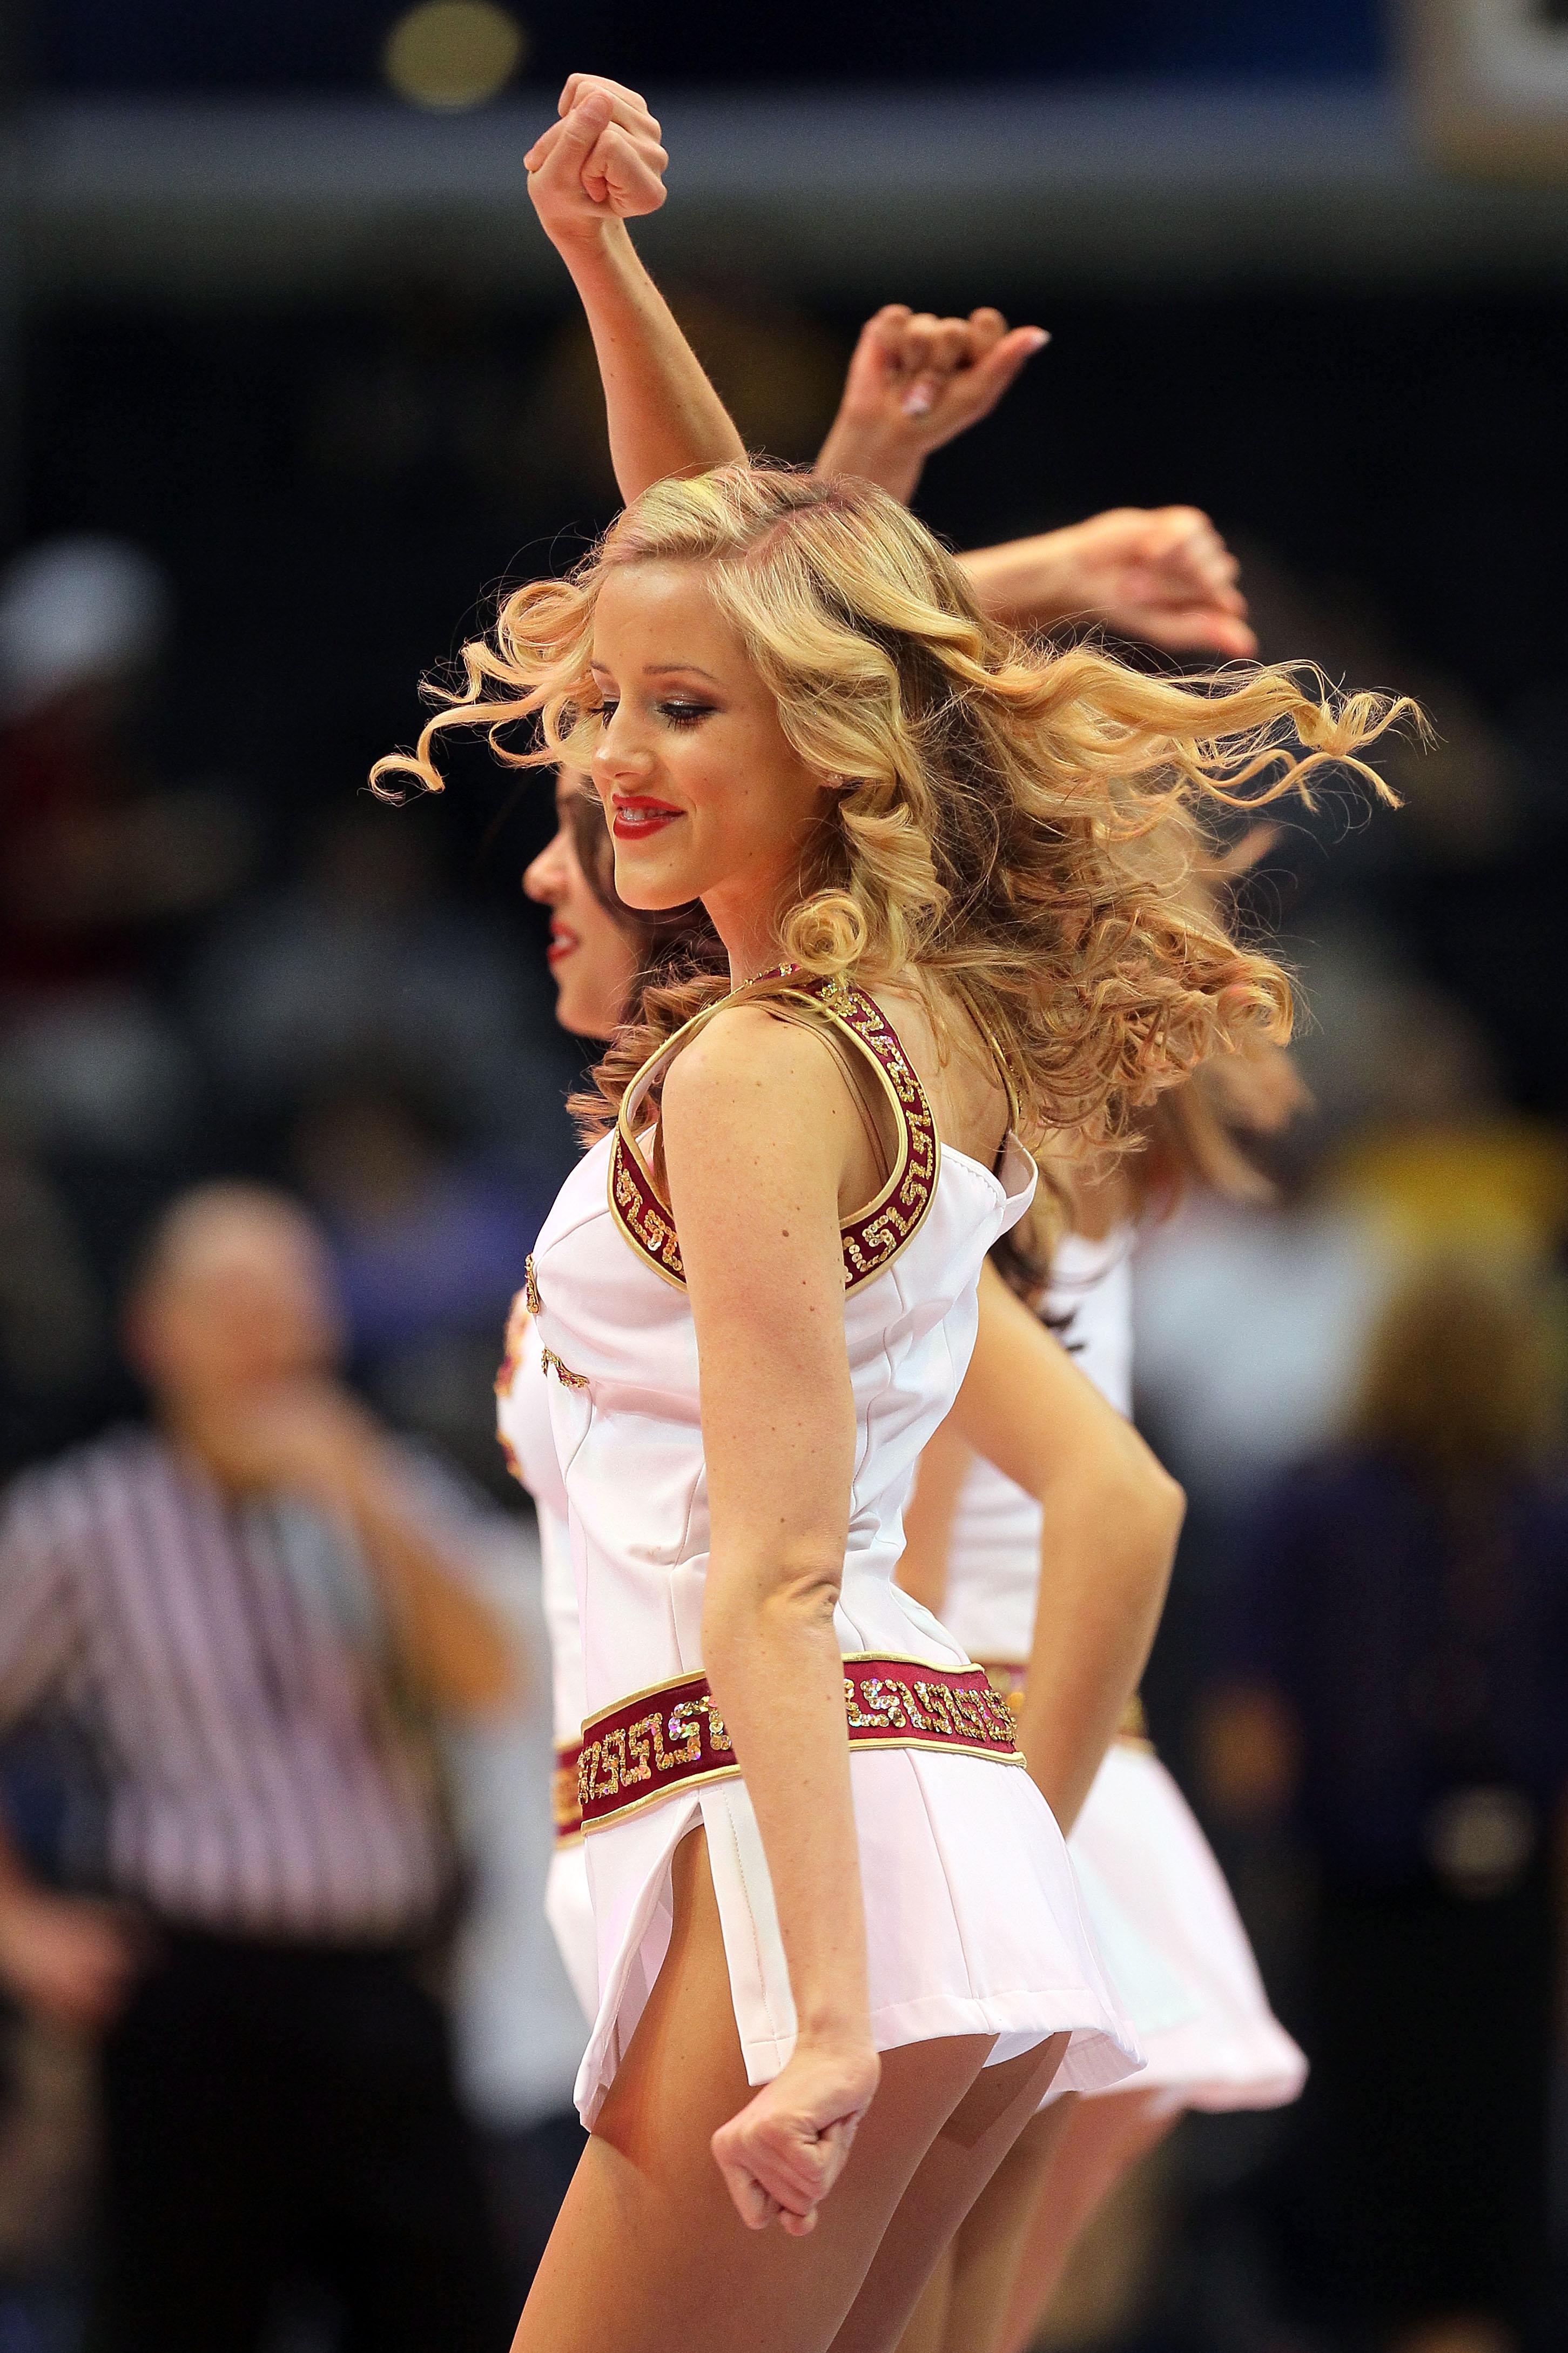 Usc cheerleaders hot